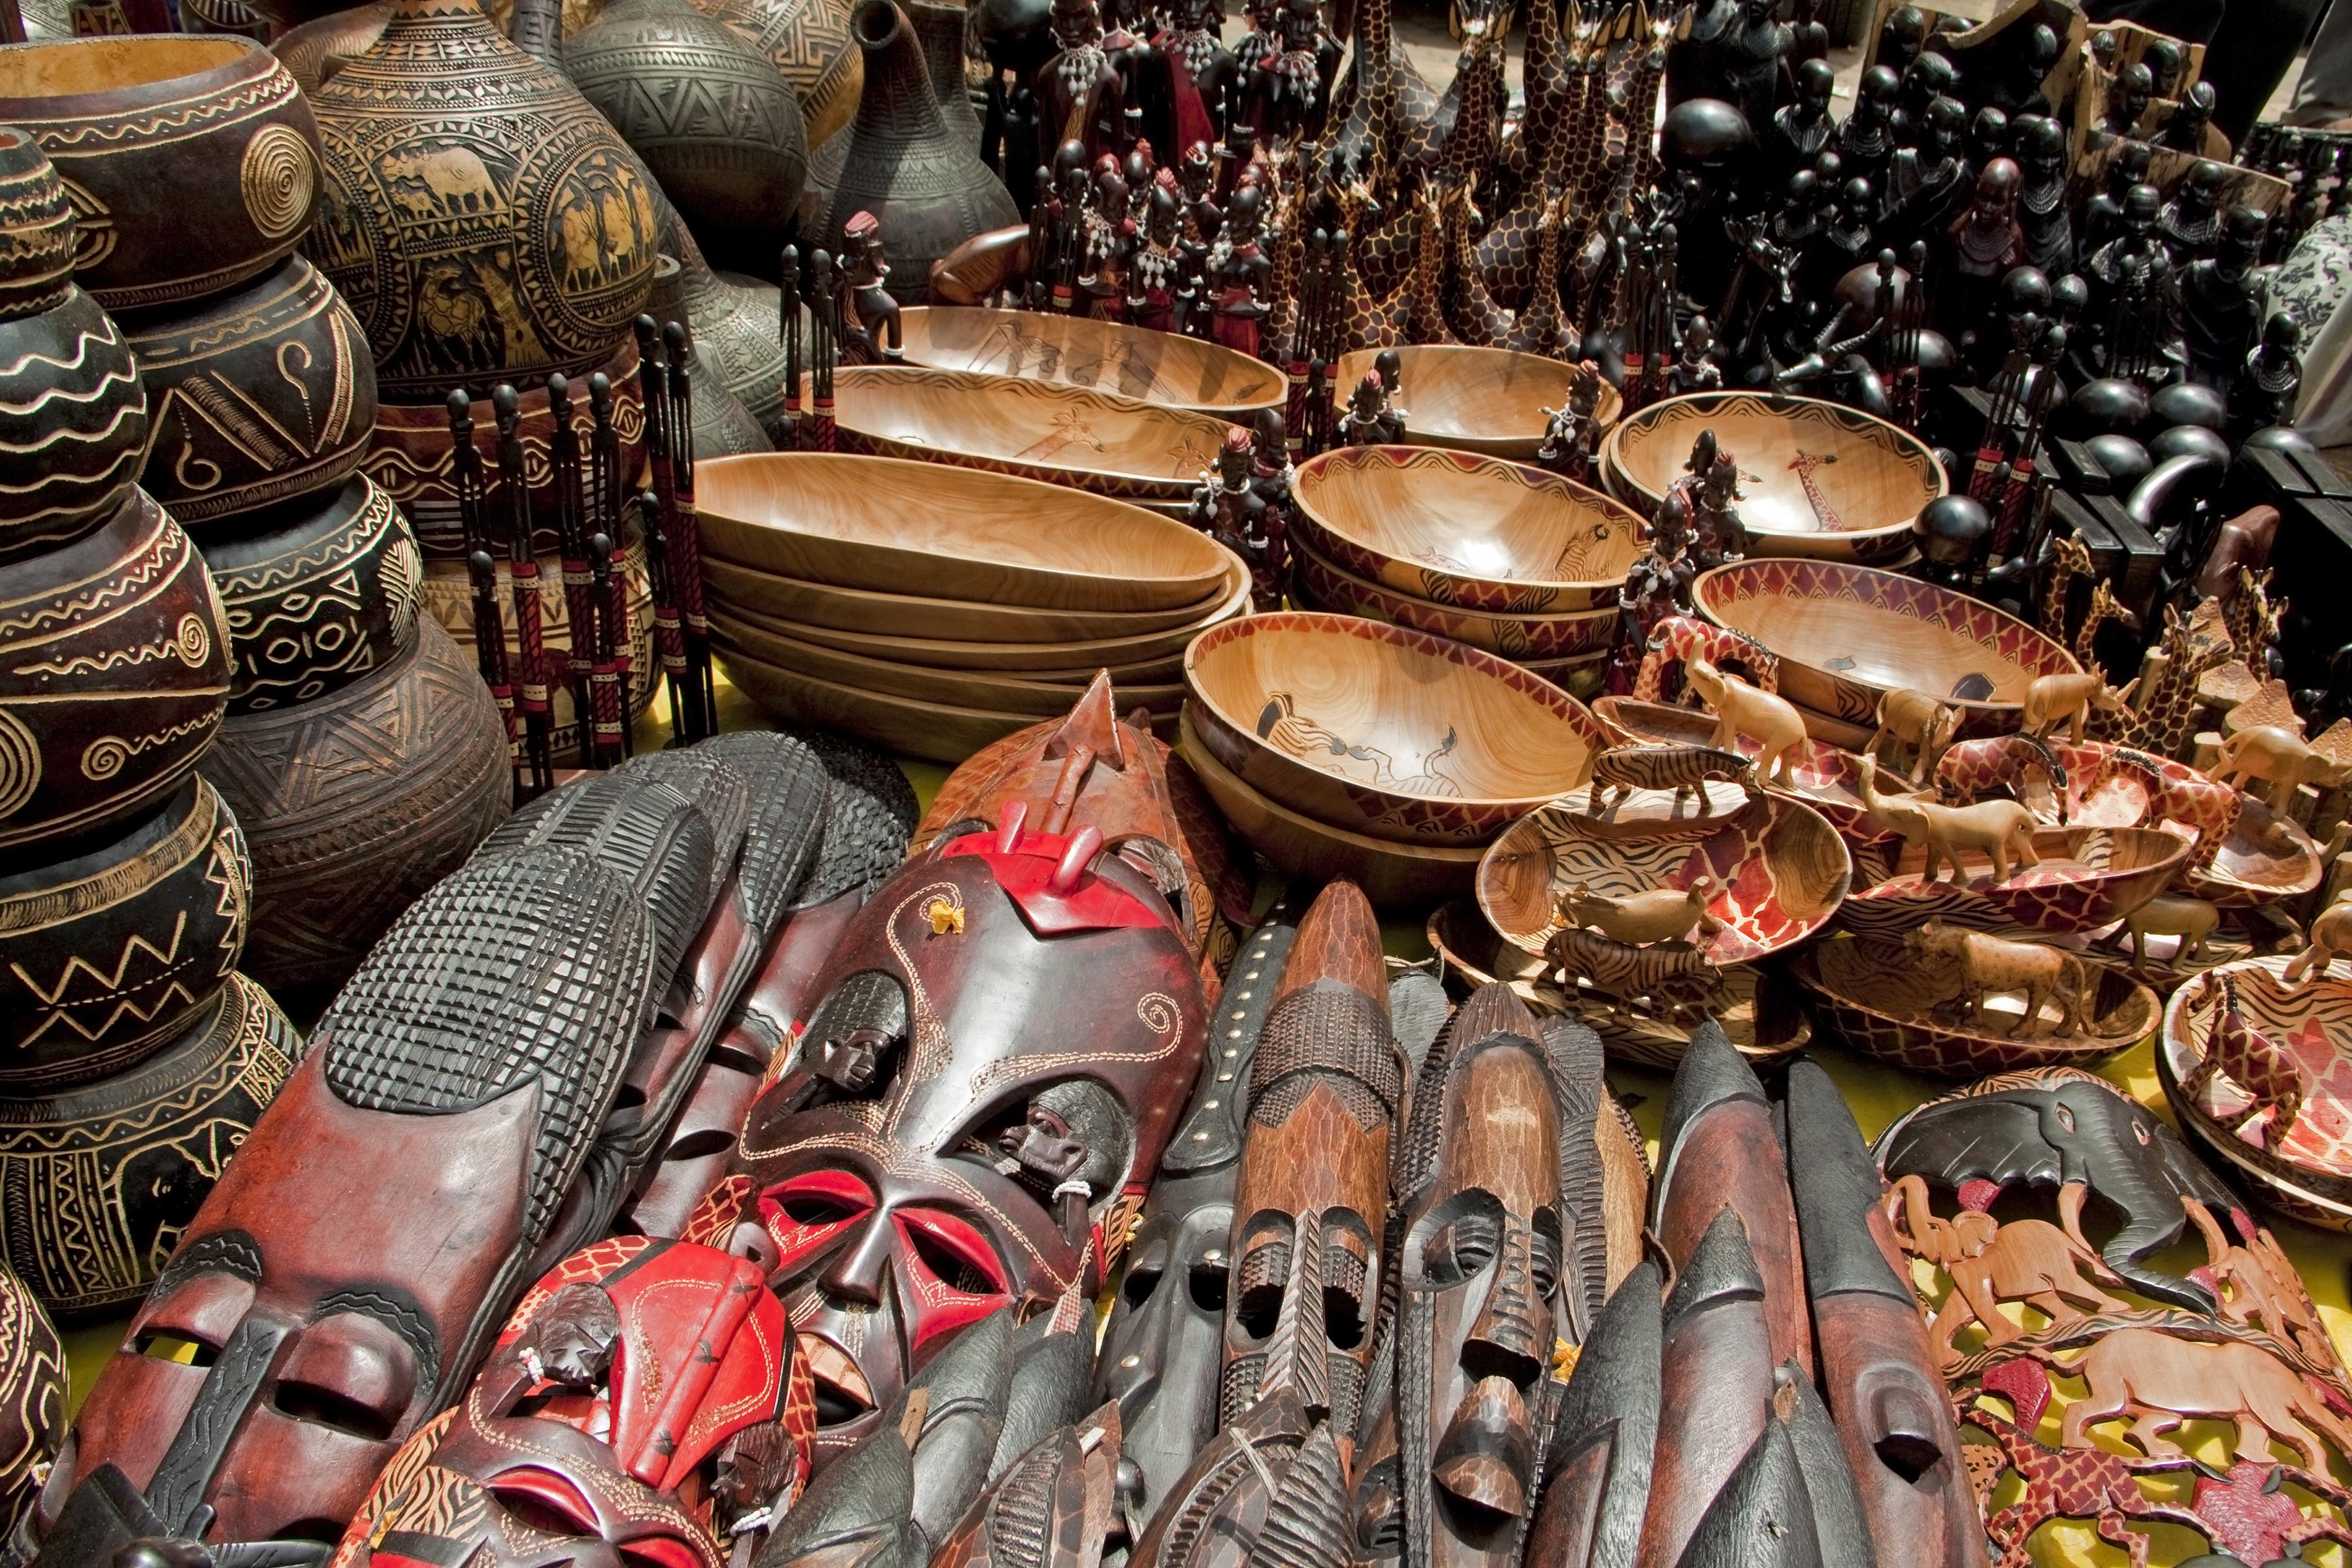 Descubre Kenia a través de sus mercados más auténticos - Kenia Safari Safari Kenia y Tanzania: Ngorongoro